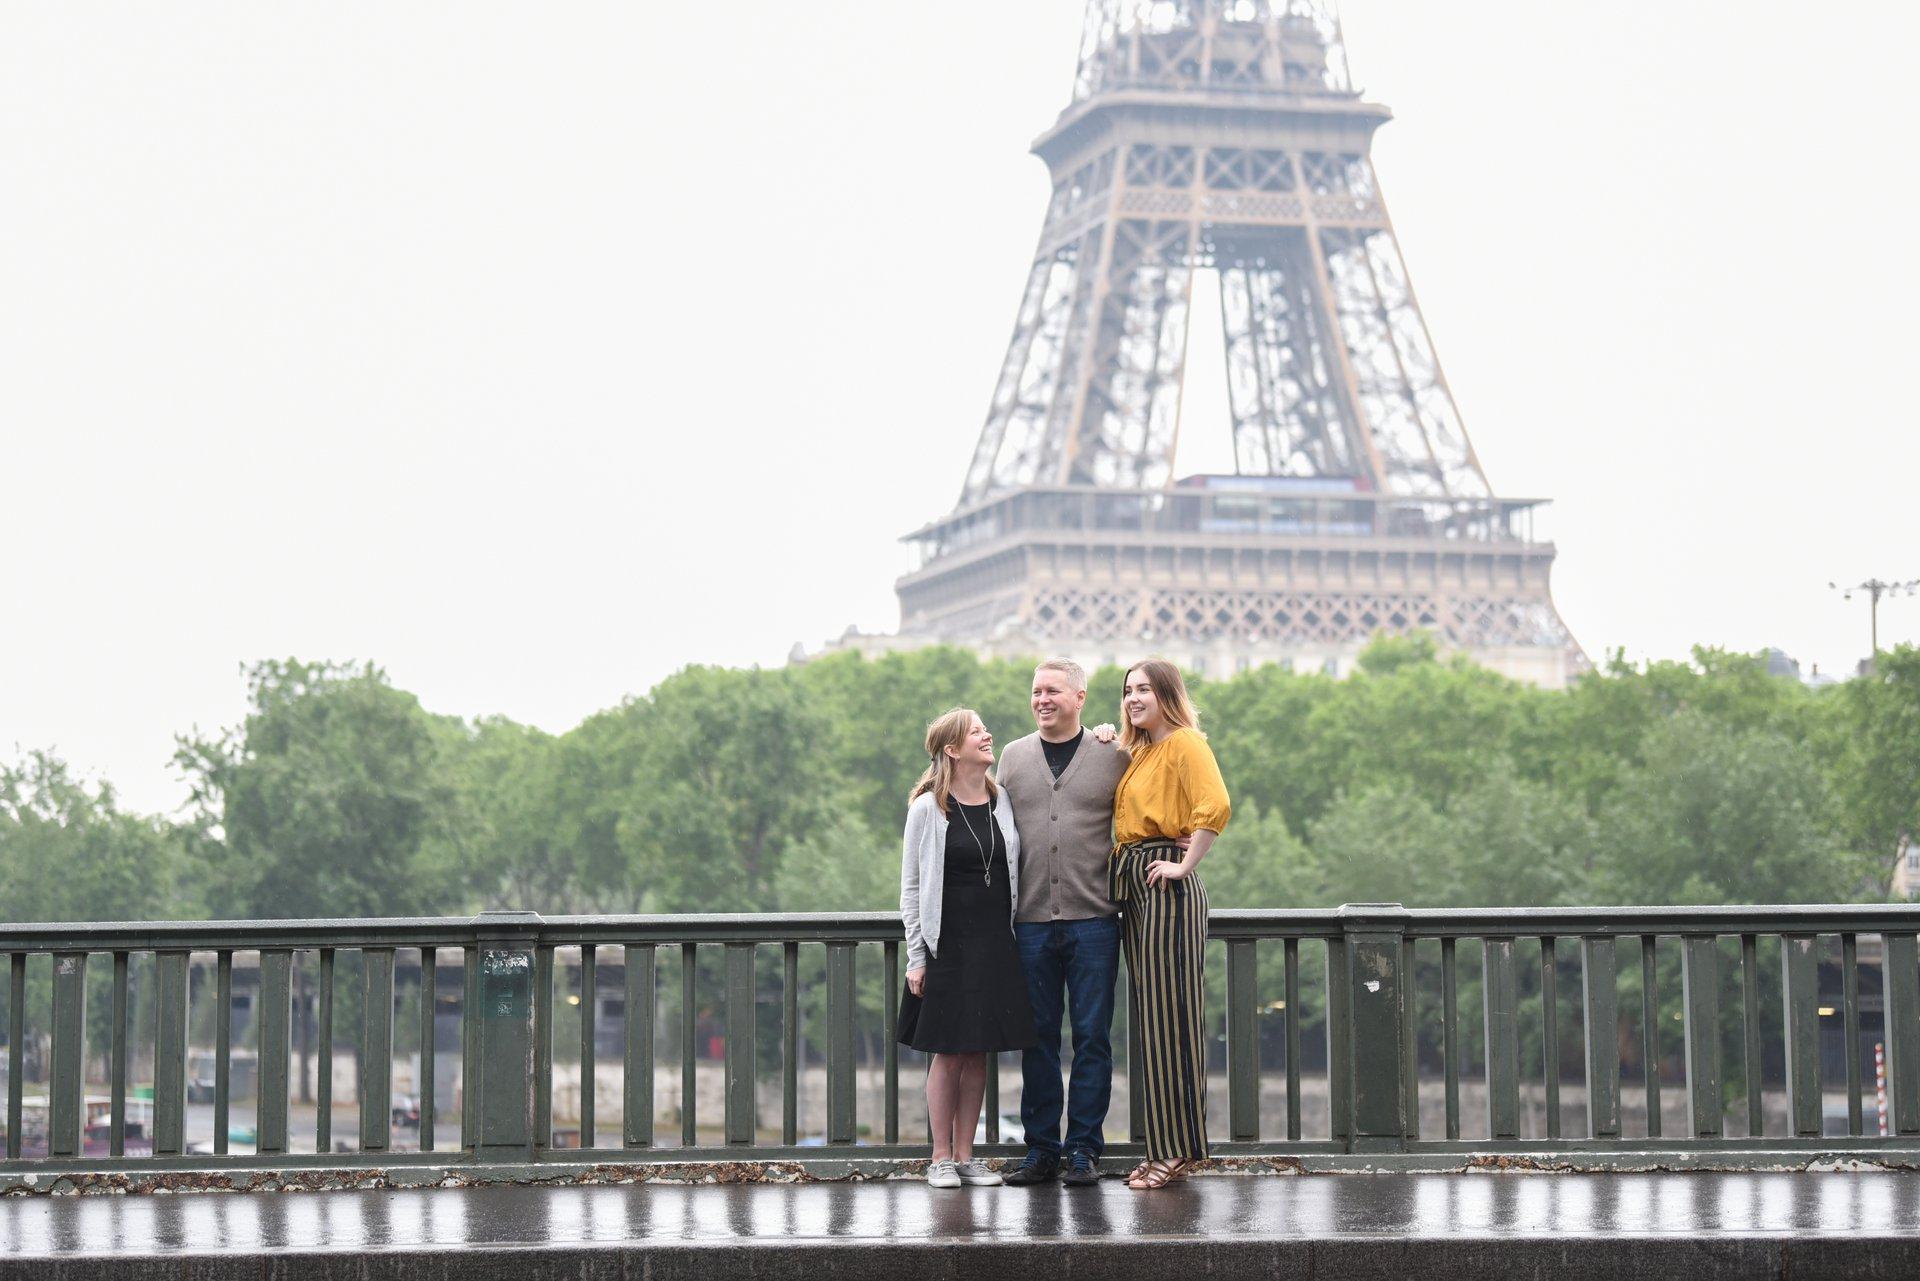 Paris-France-travel-story-Flytographer-15